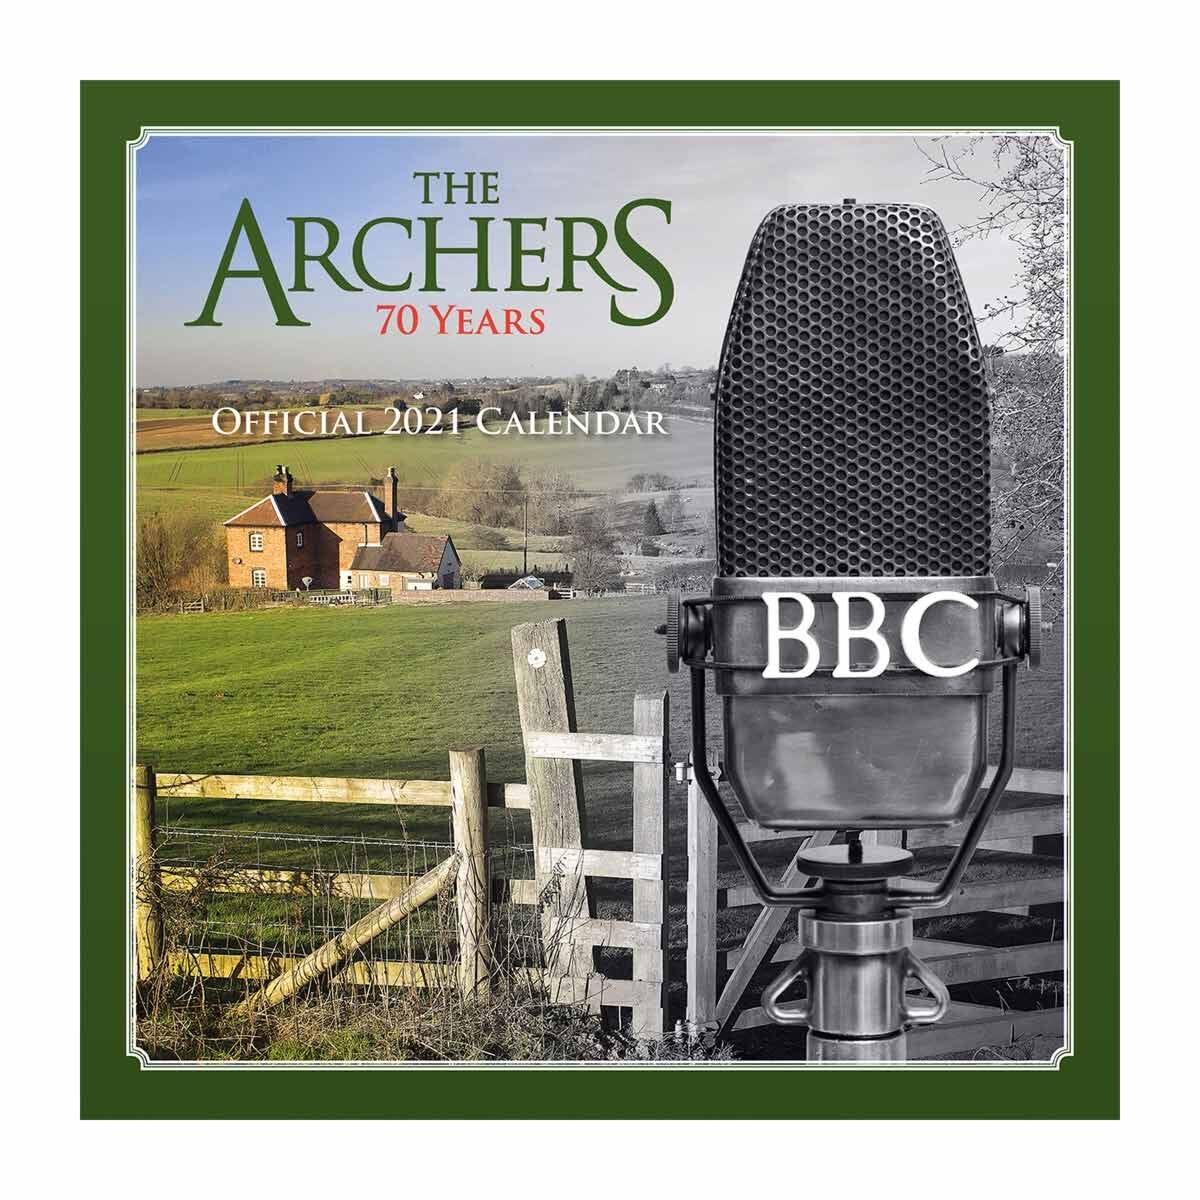 The Archers Wall Calendar 2021